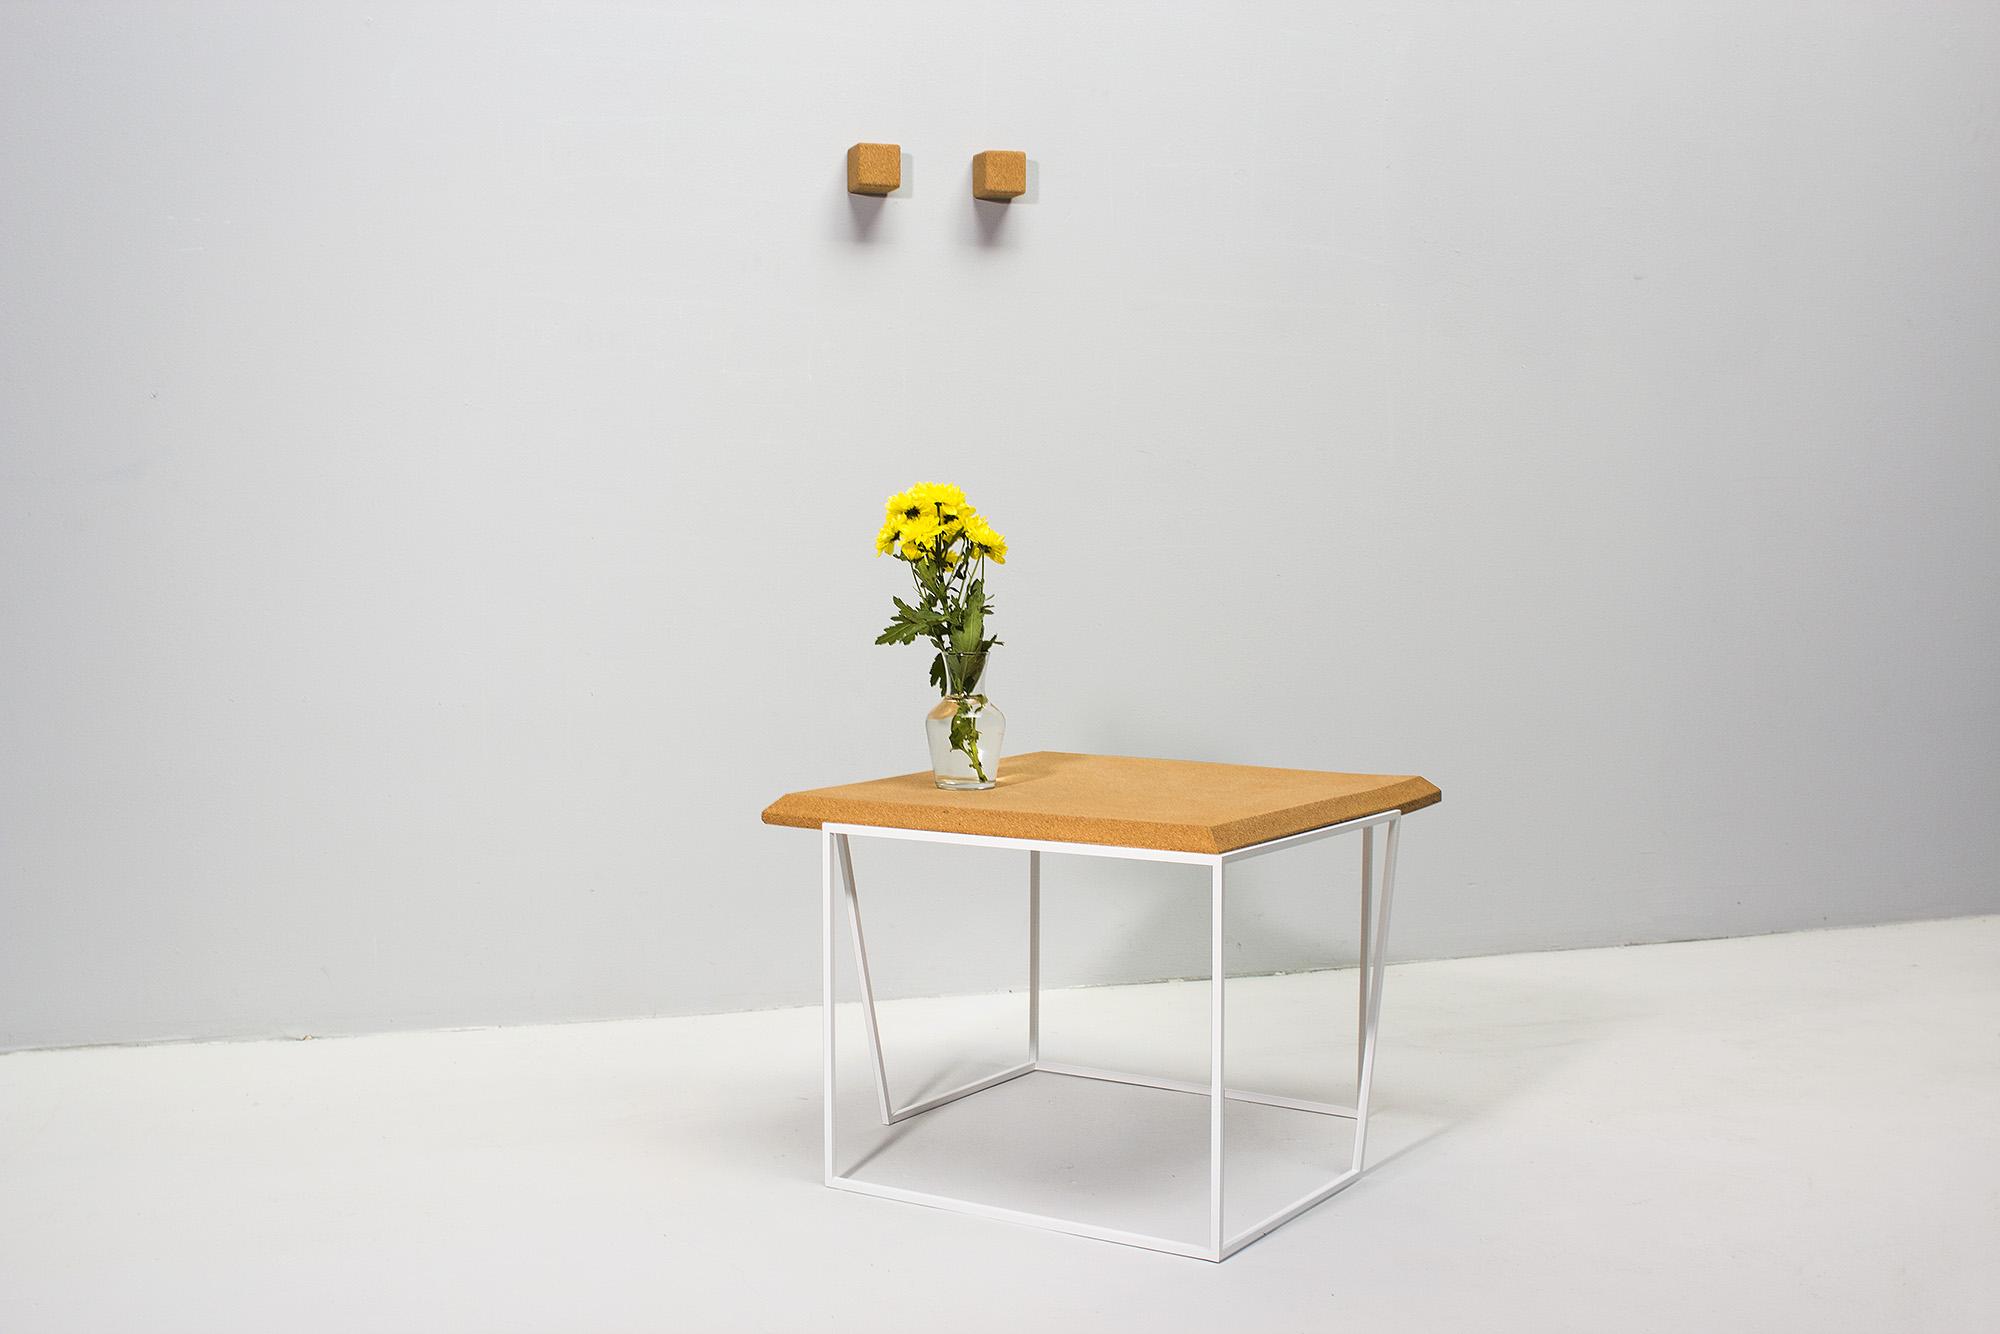 low-Galula-Grão-coffee-table-2-light-cork-white-04.jpg